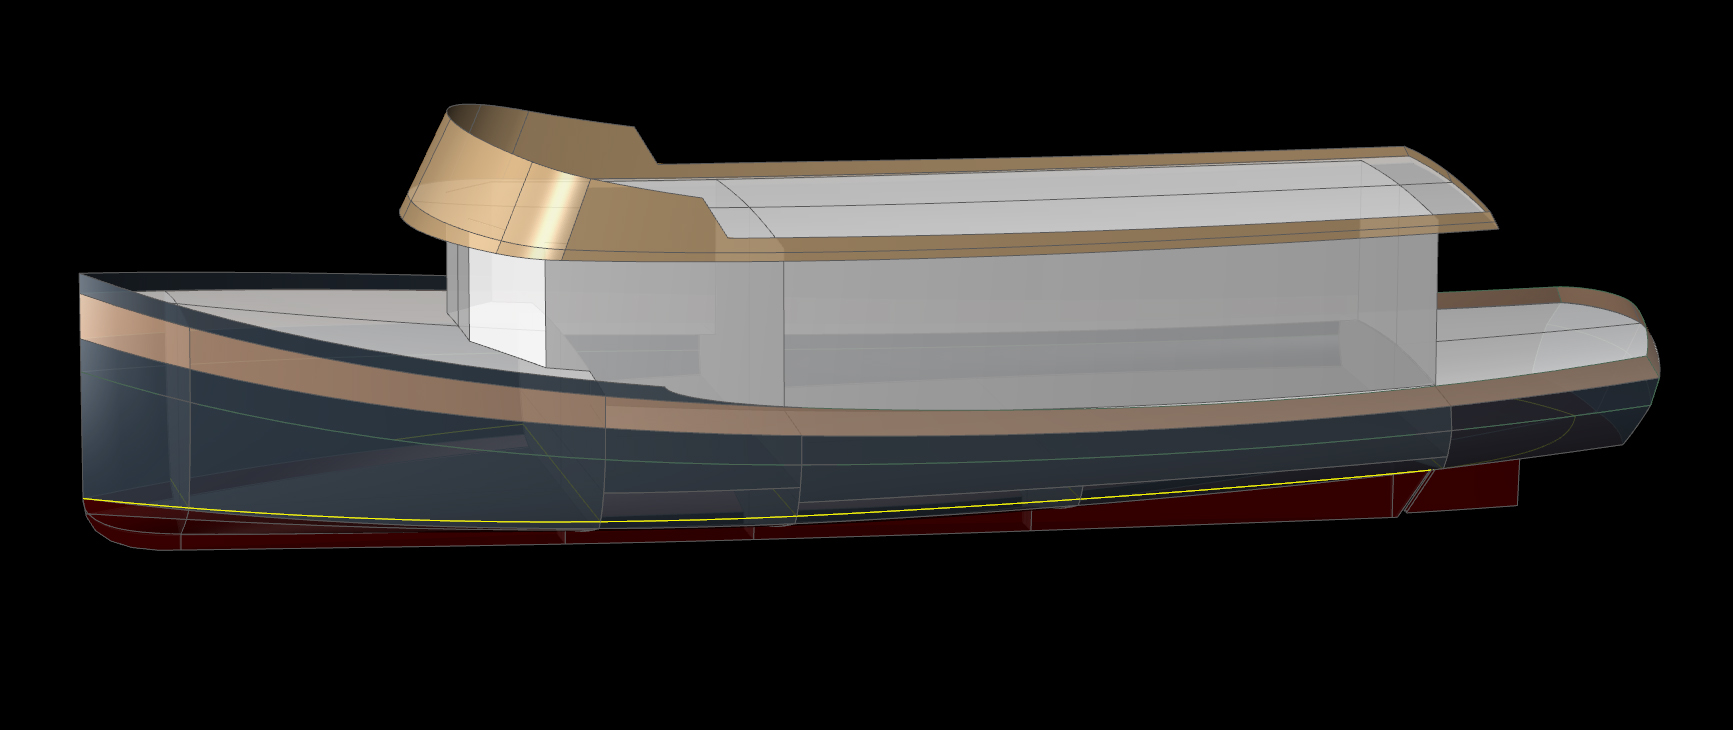 50' River Boat AMAZON - Kasten Marine Design